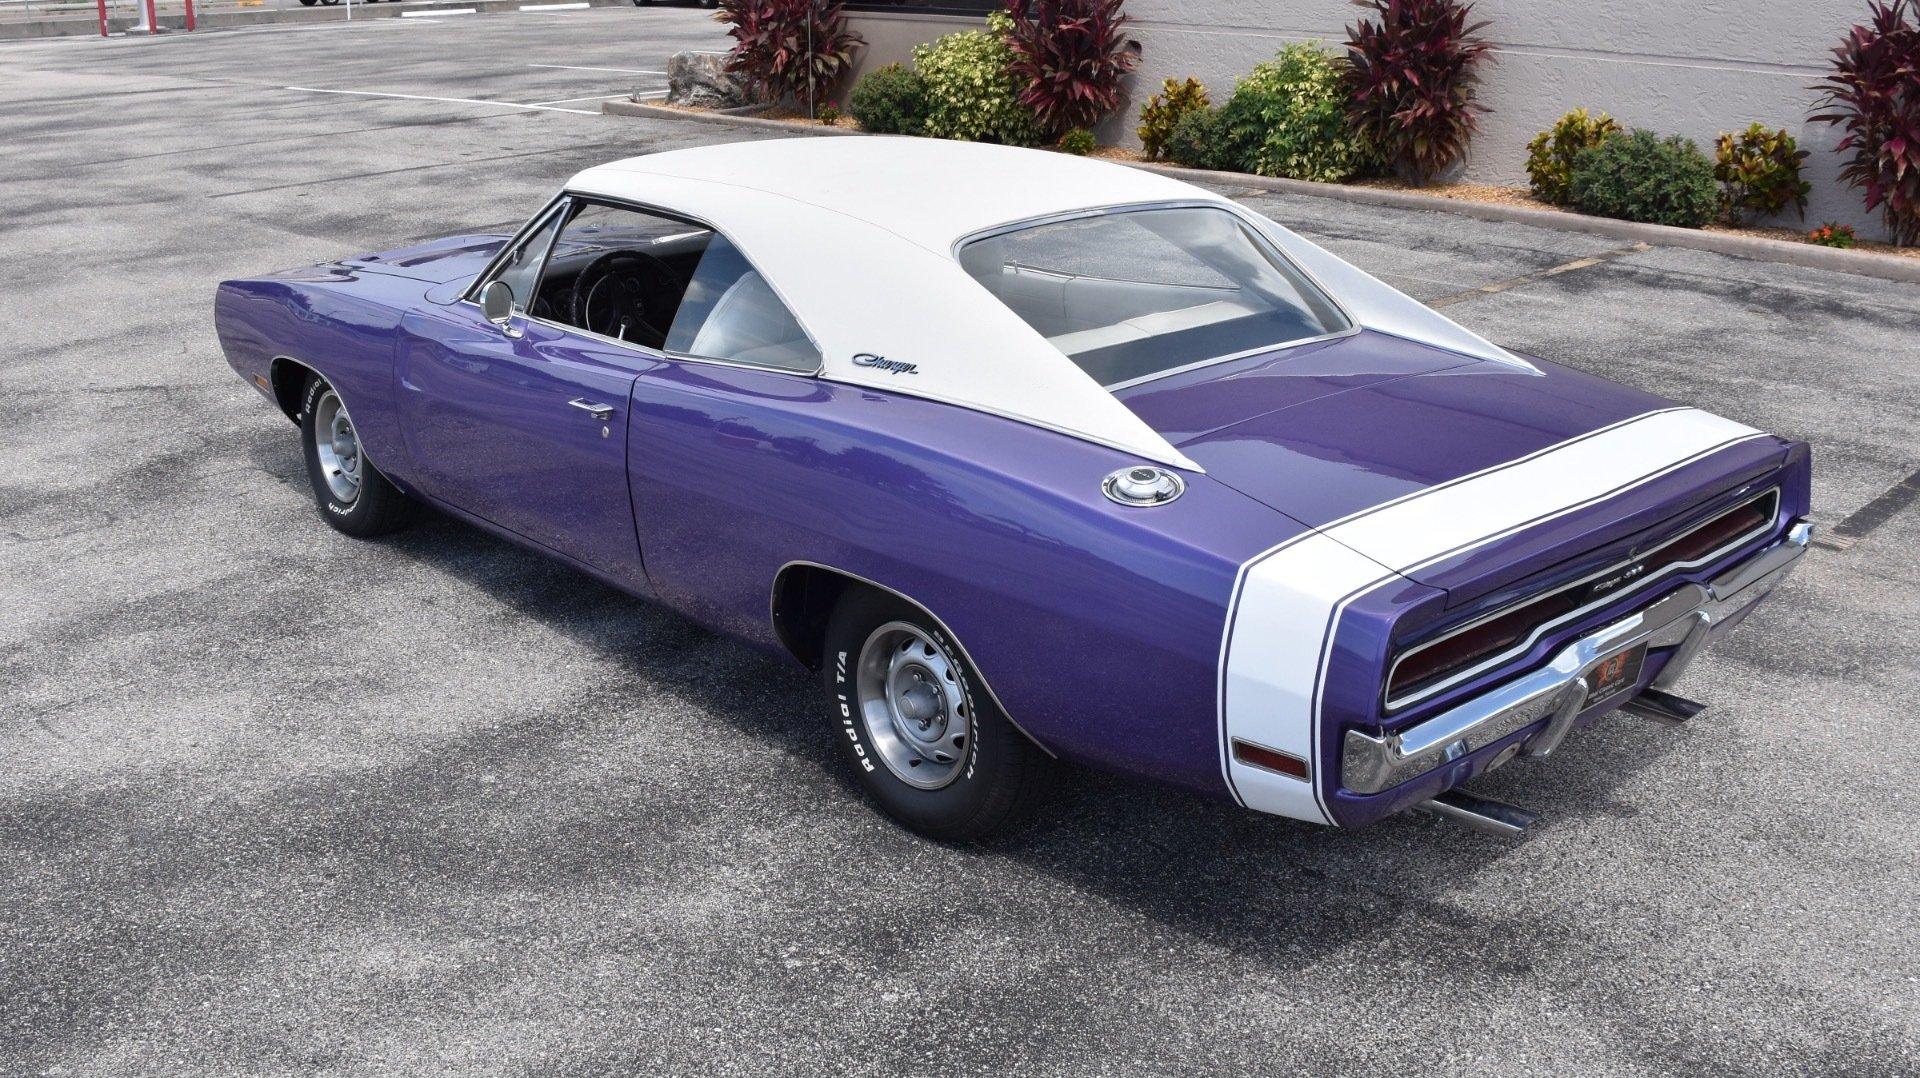 1970 Dodge Charger 383 Auto Plum Crazy Purple Ideal Classic Cars Llc